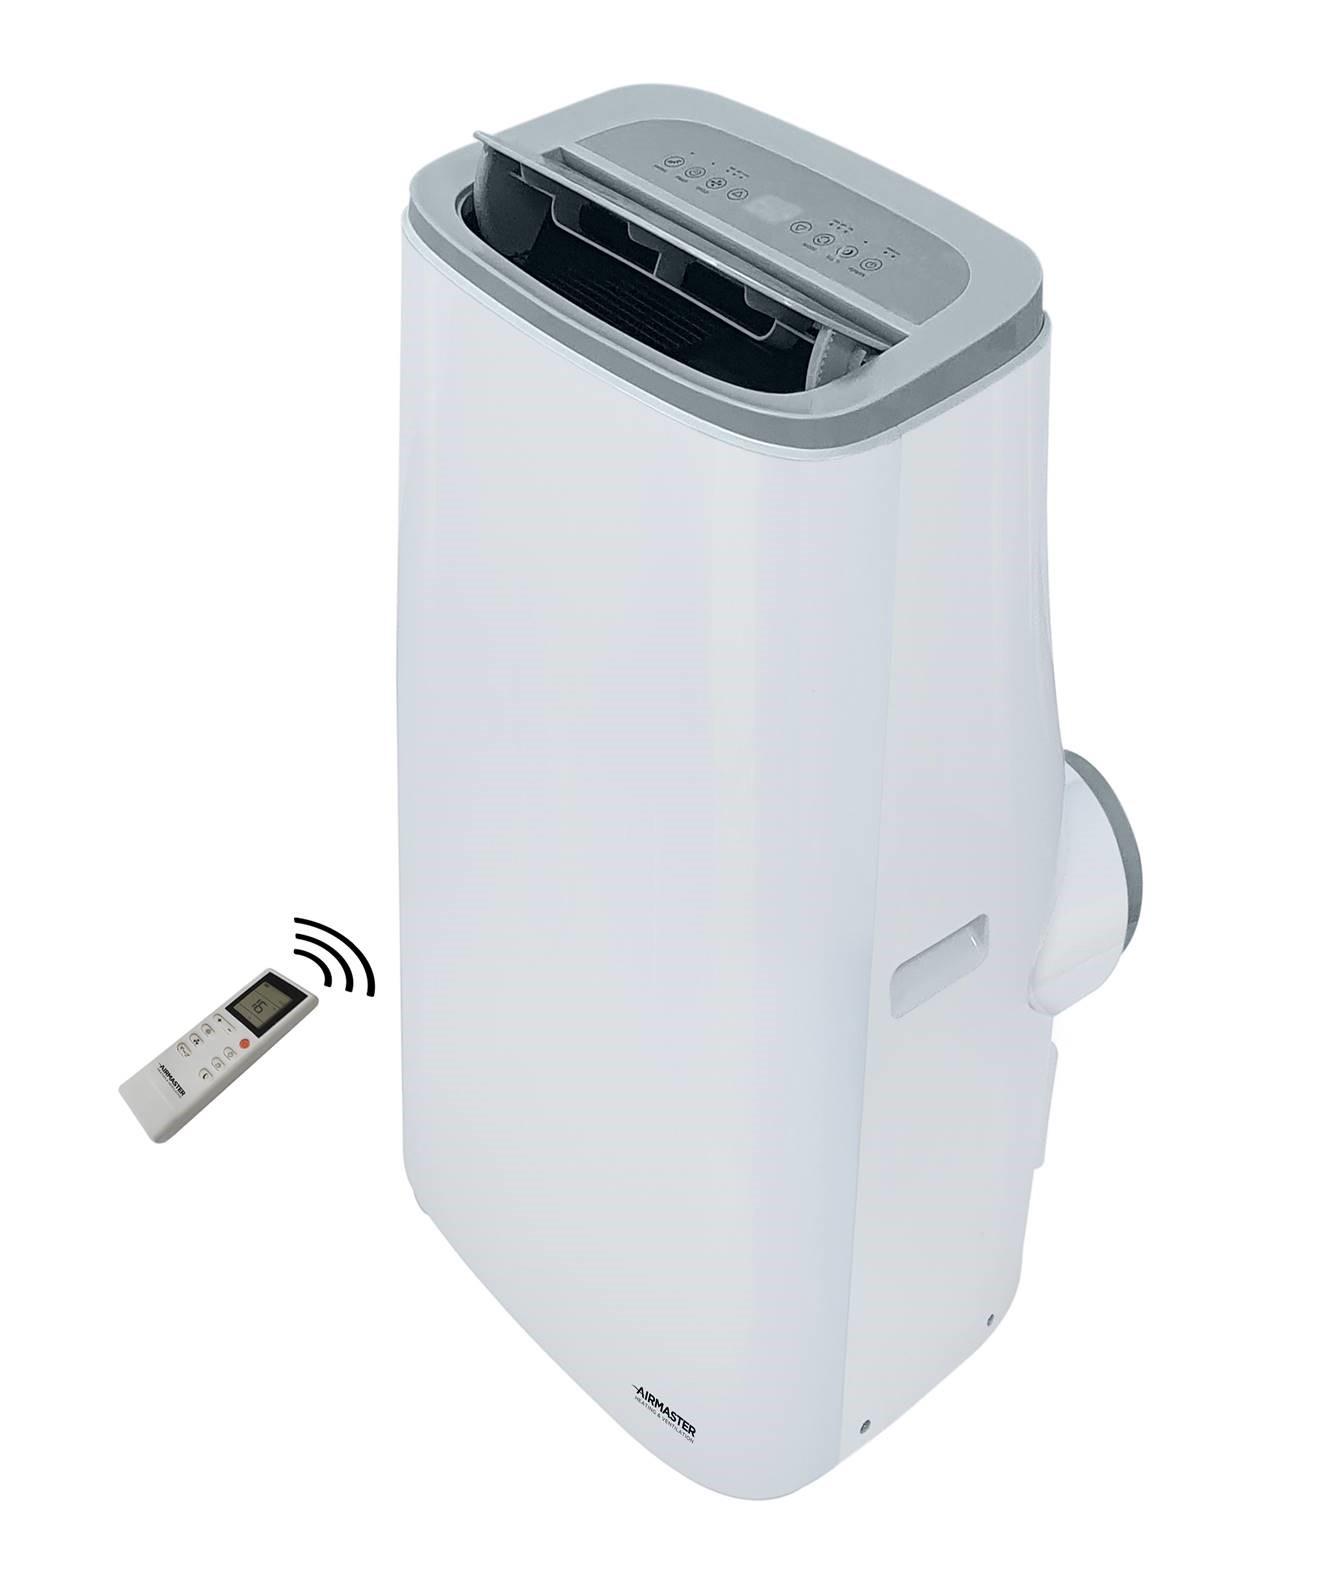 Portable Air Conditioner with Remote Control - White